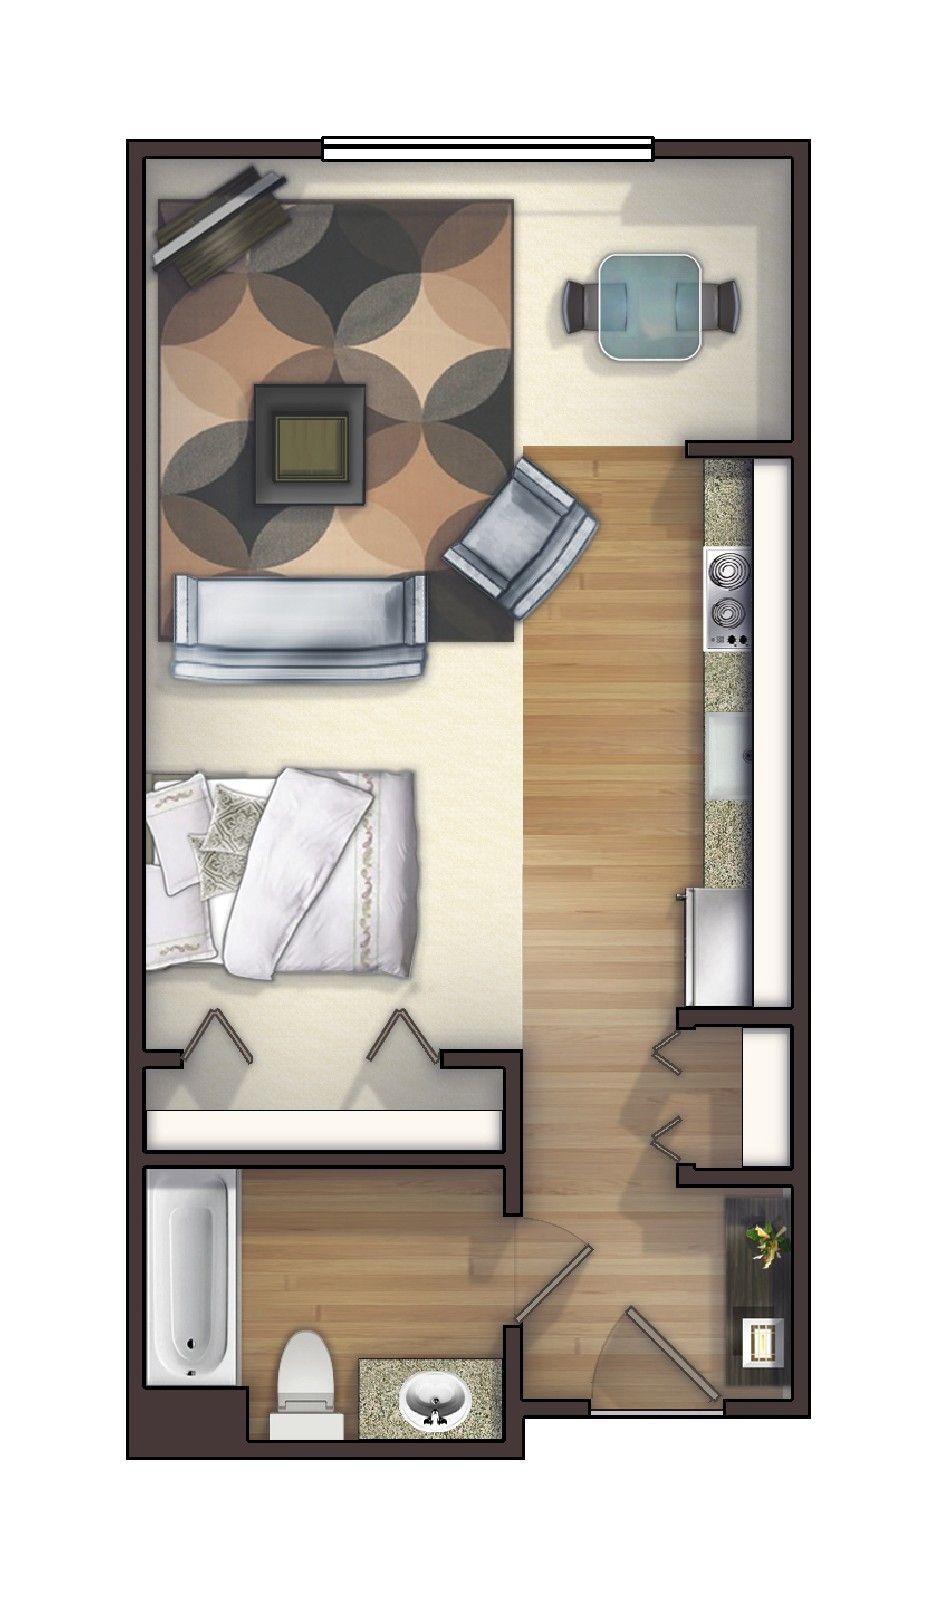 Best Layout Ideas For One Room Apartment Design 6 V 2020 G Kvartira V Garazhe Plan Doma Plan Kroshechnogo Doma